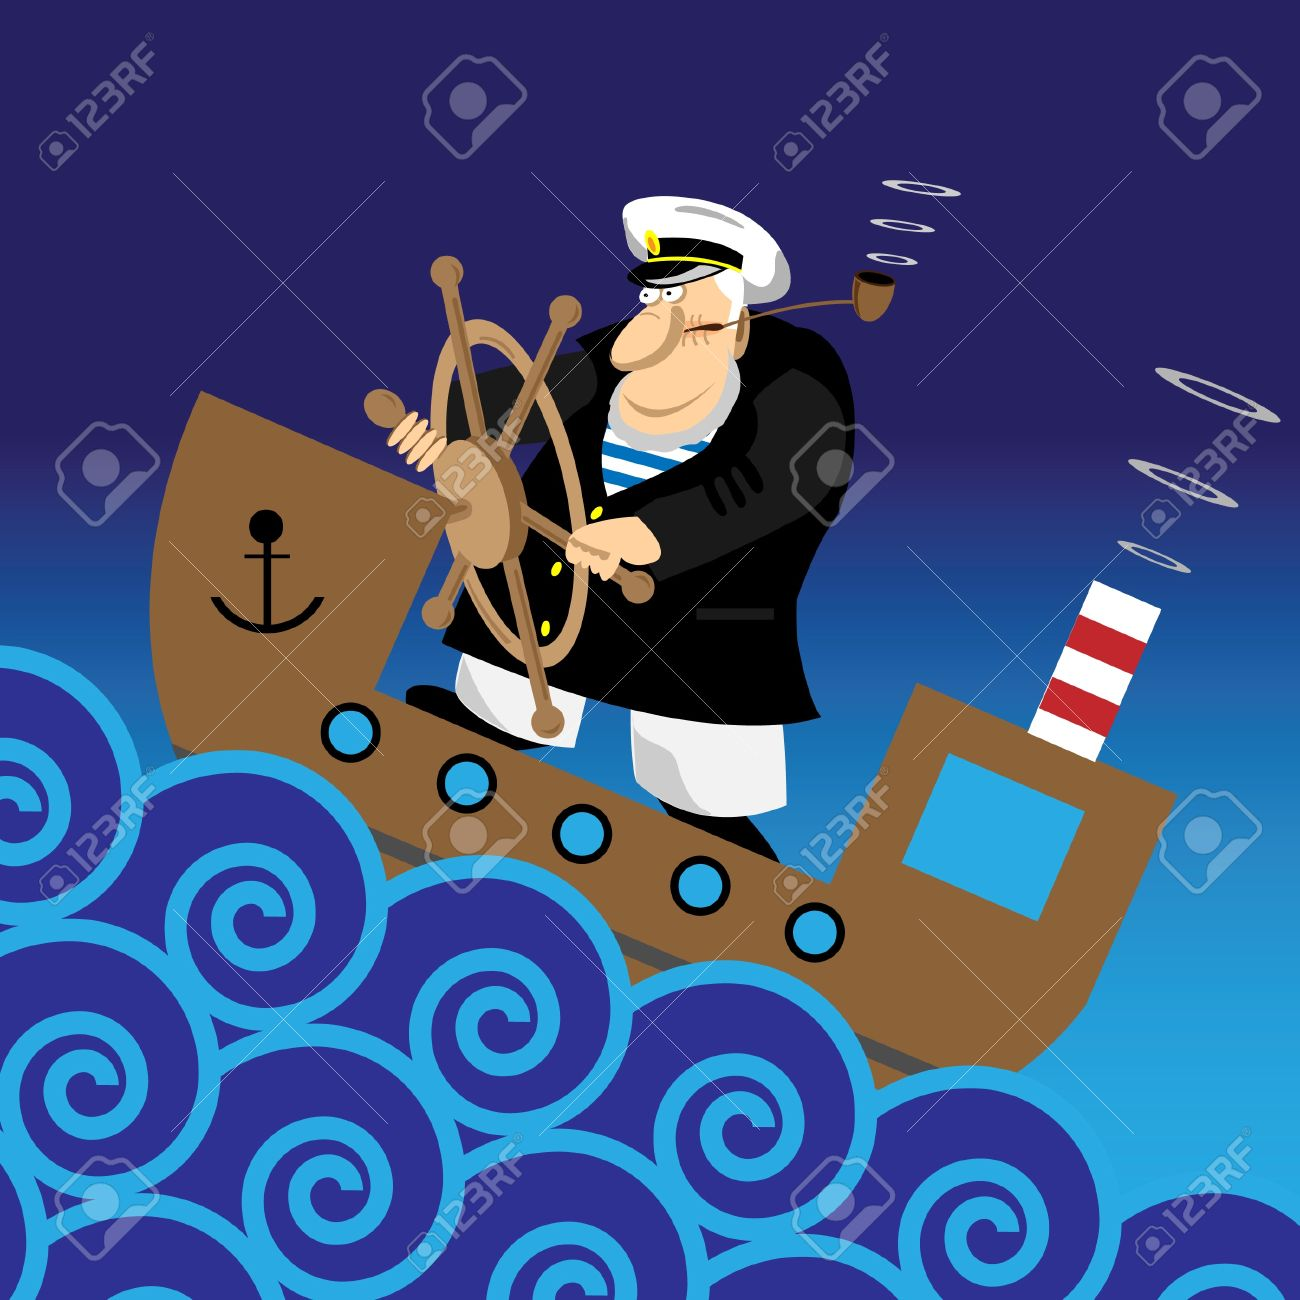 Sailor at sea clipart.